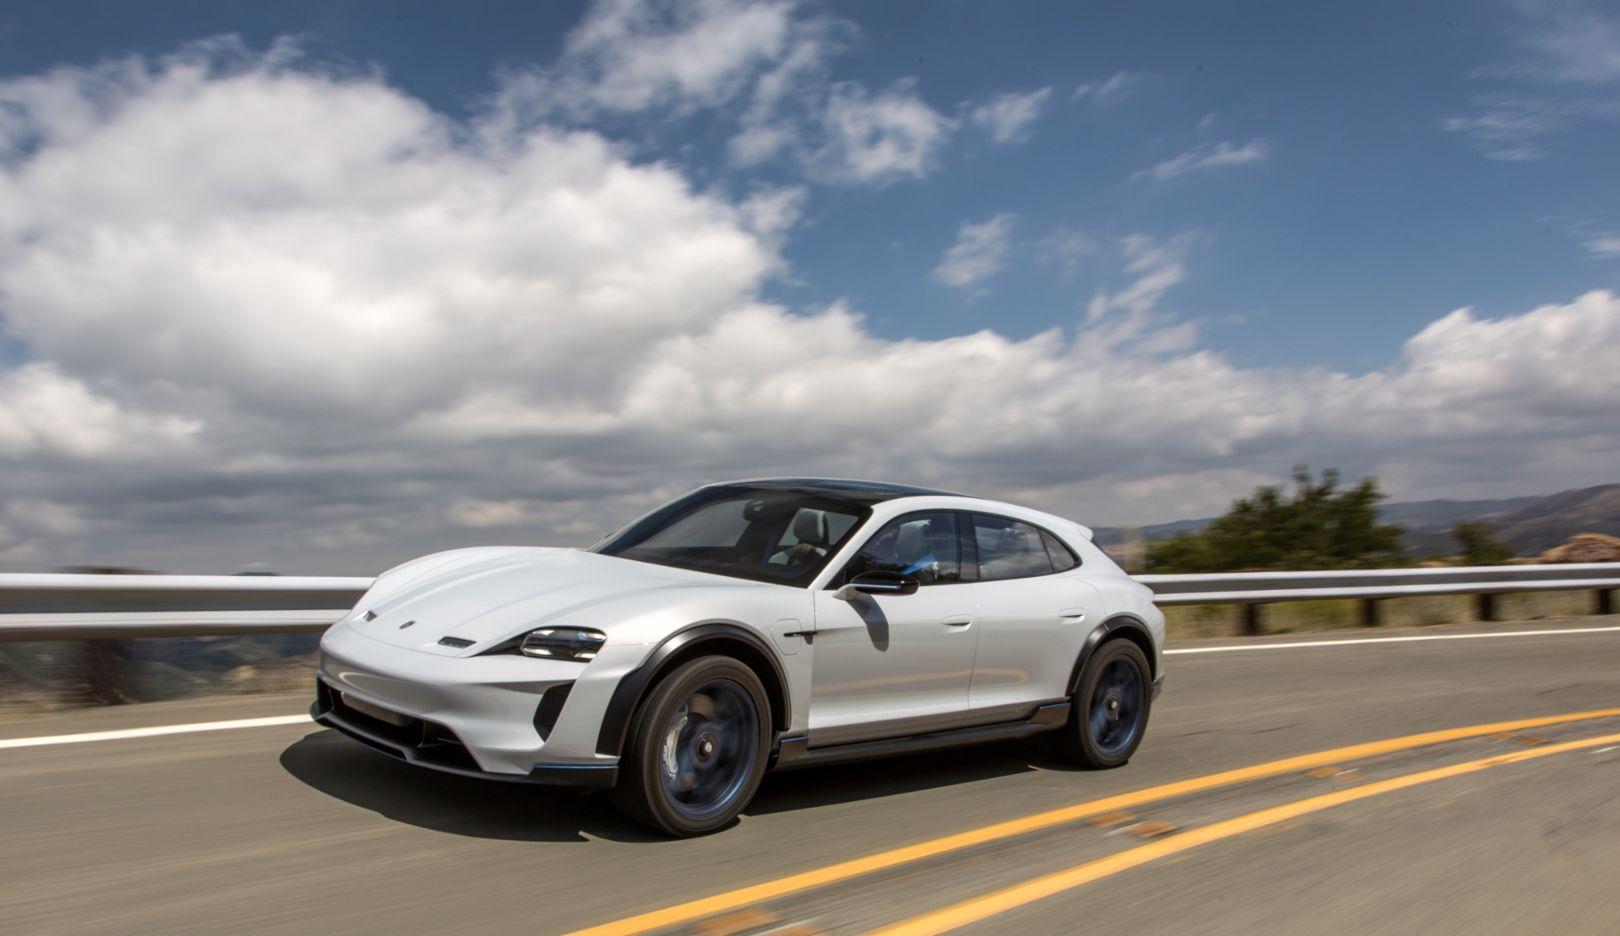 Porsche Mission E Cross Turismo, 2018, Porsche AG